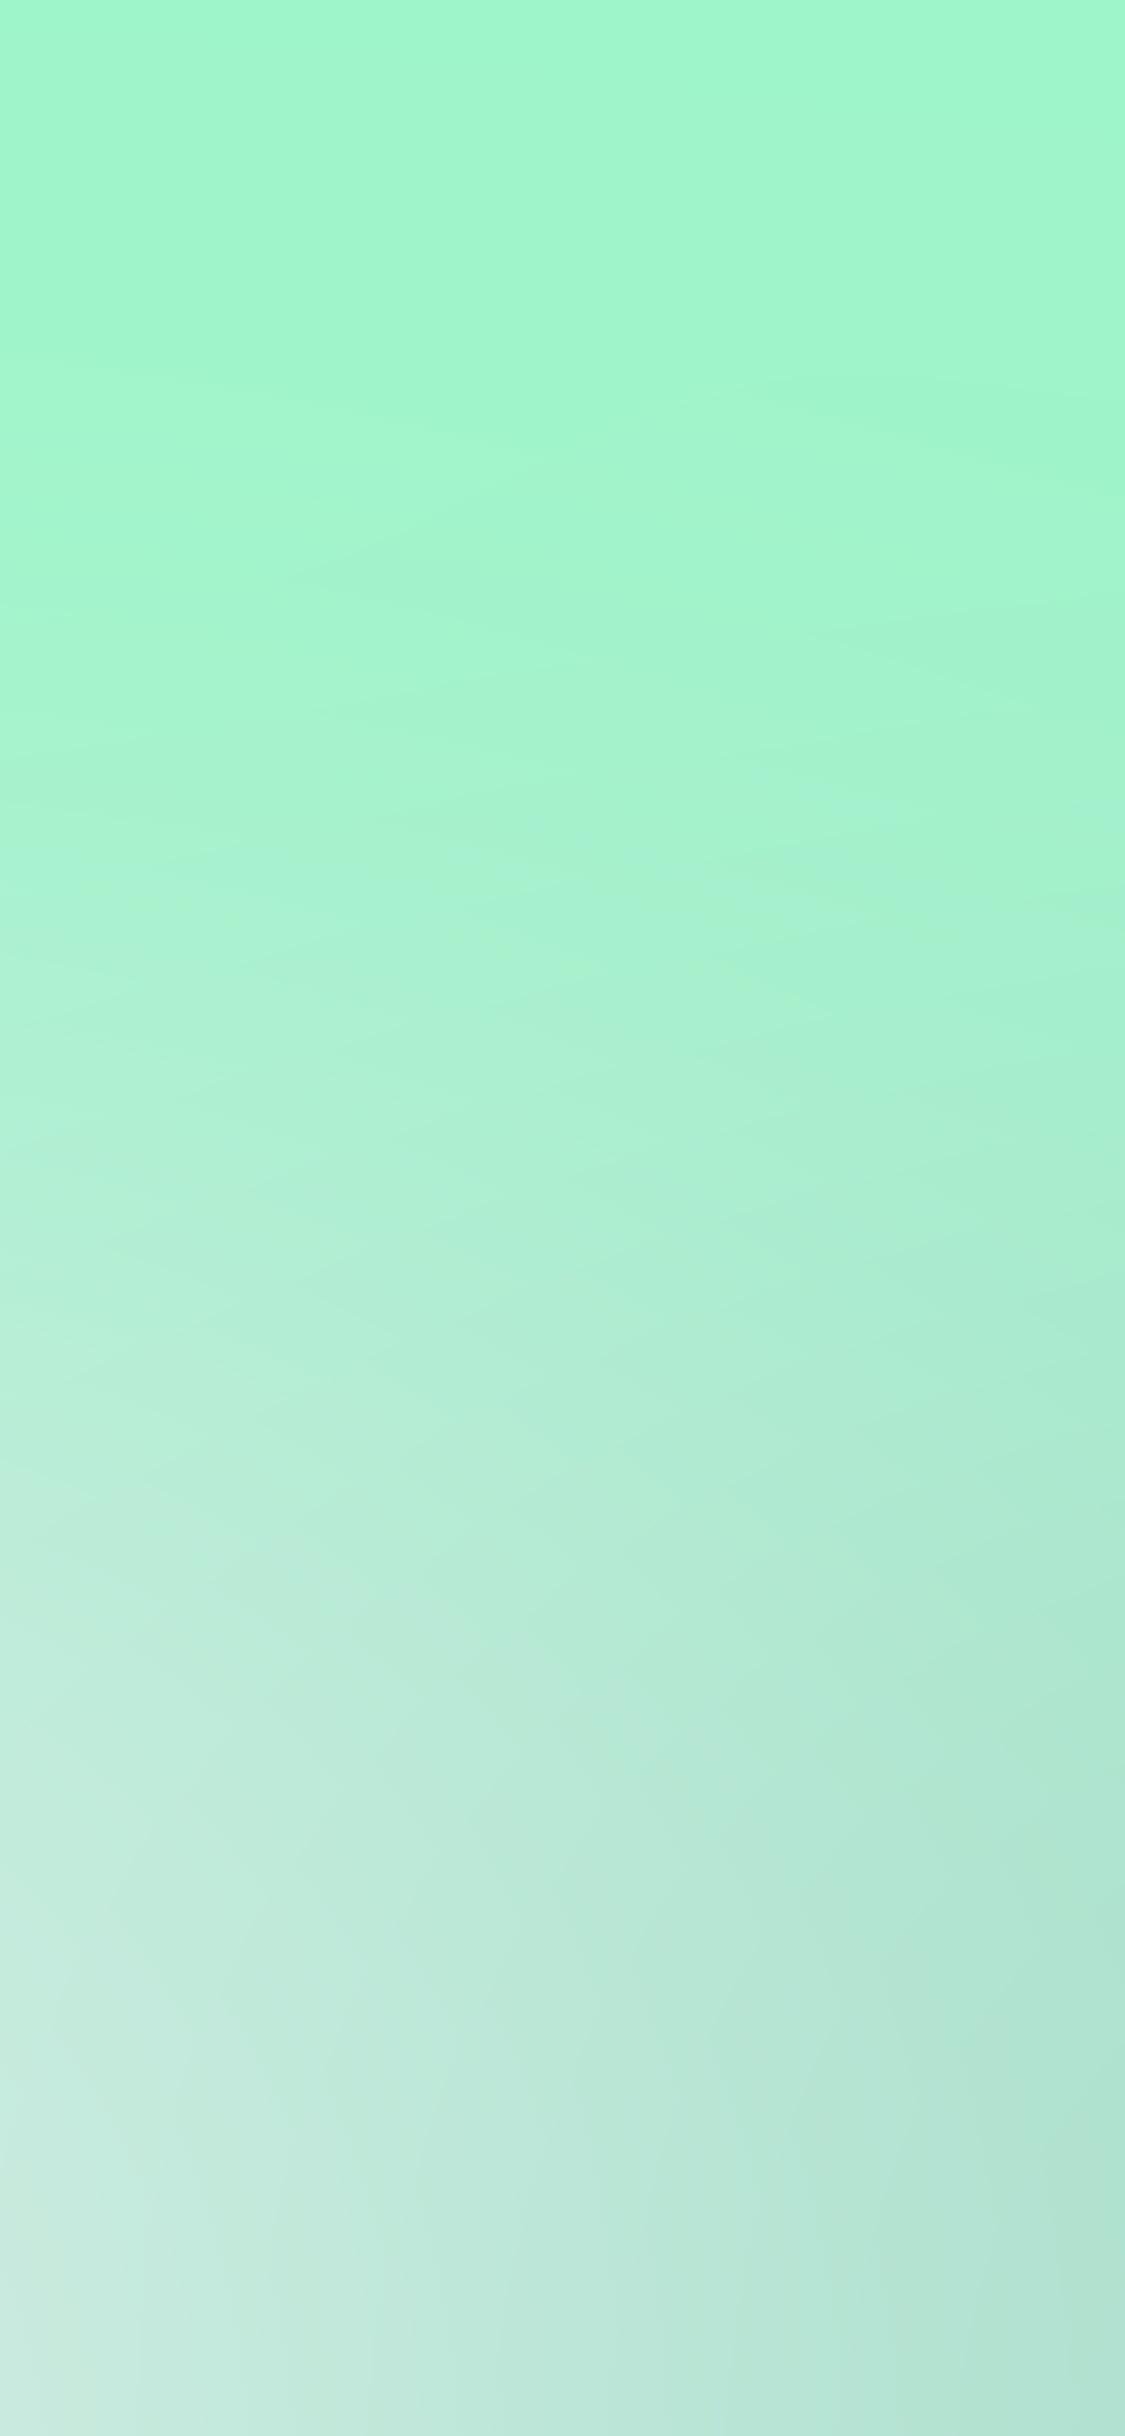 iPhonexpapers.com-Apple-iPhone-wallpaper-so40-blur-gradation-green-soft